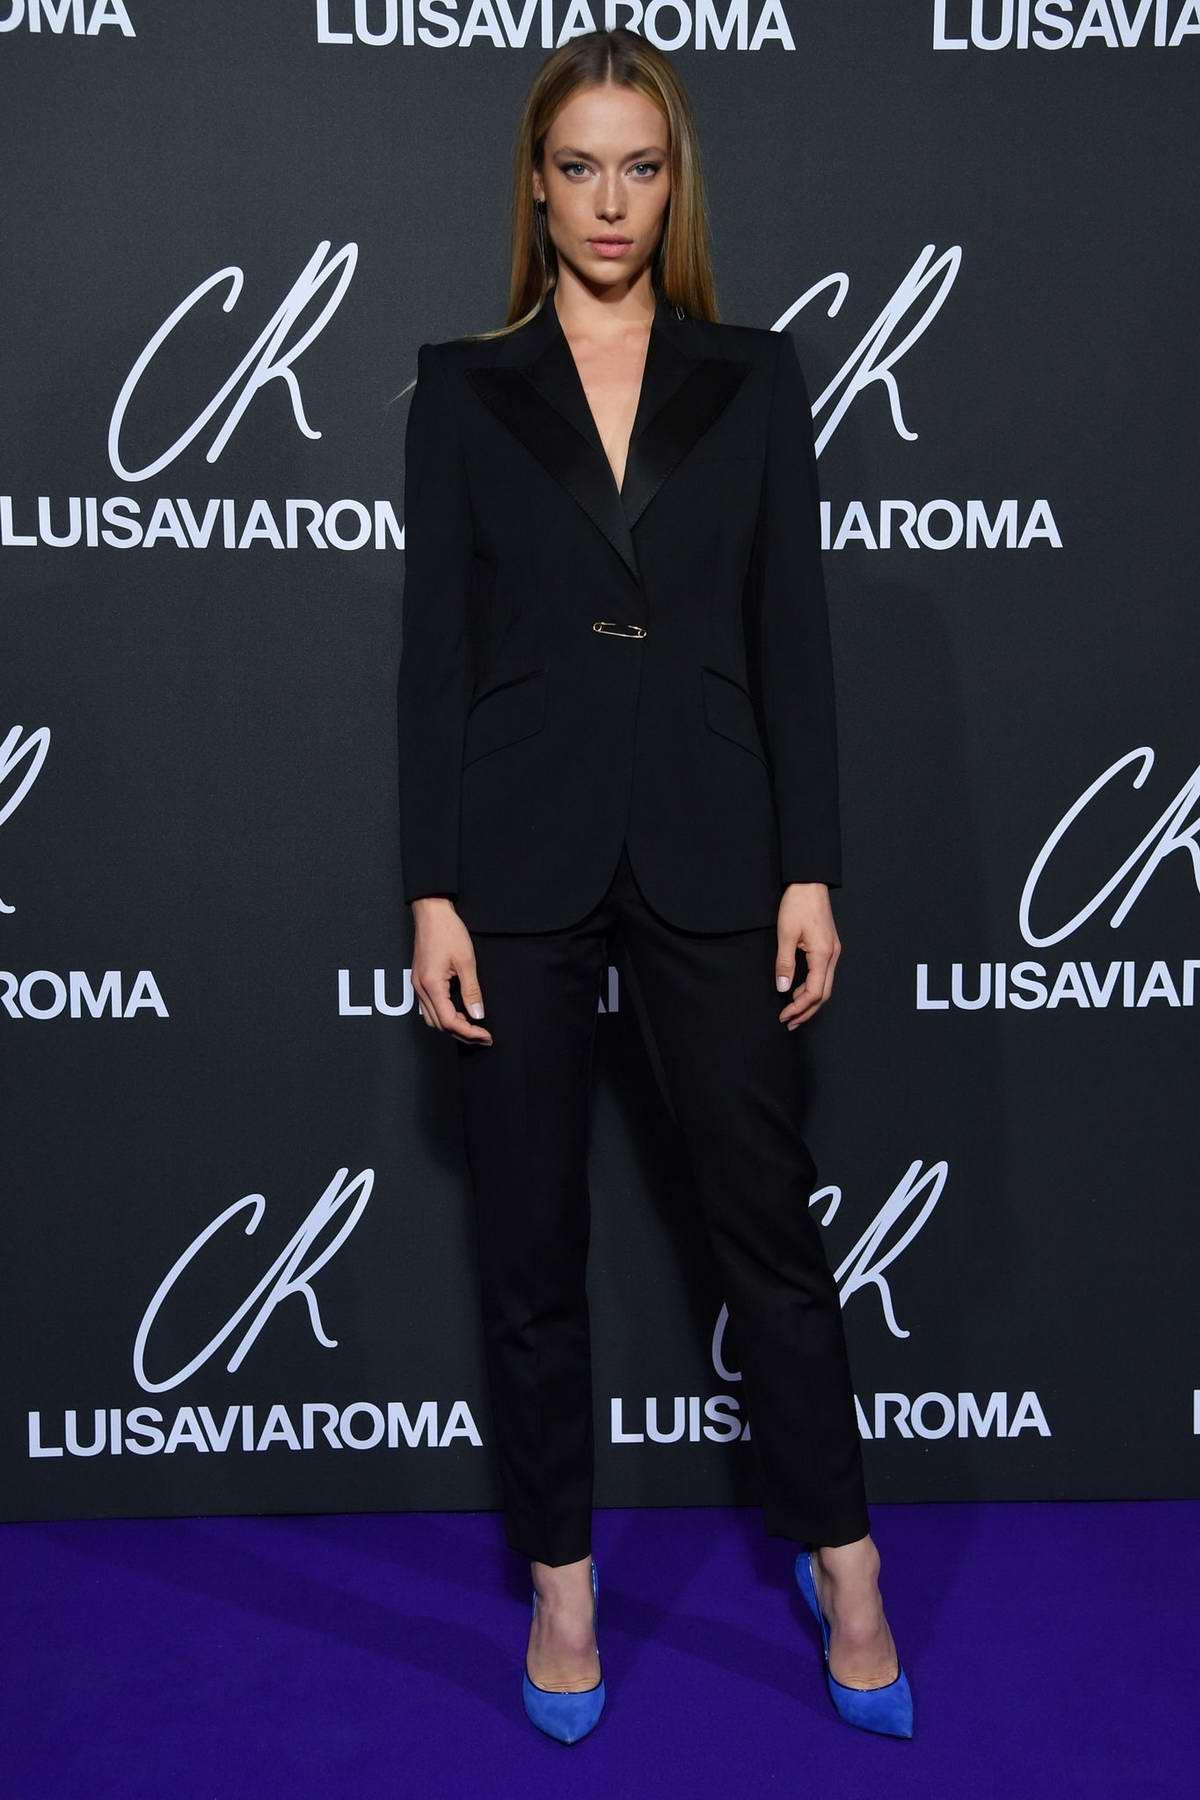 Hannah Ferguson attends the CR Fashion Book x Luisasaviaroma photocall during Paris Fashion Week in Paris, France